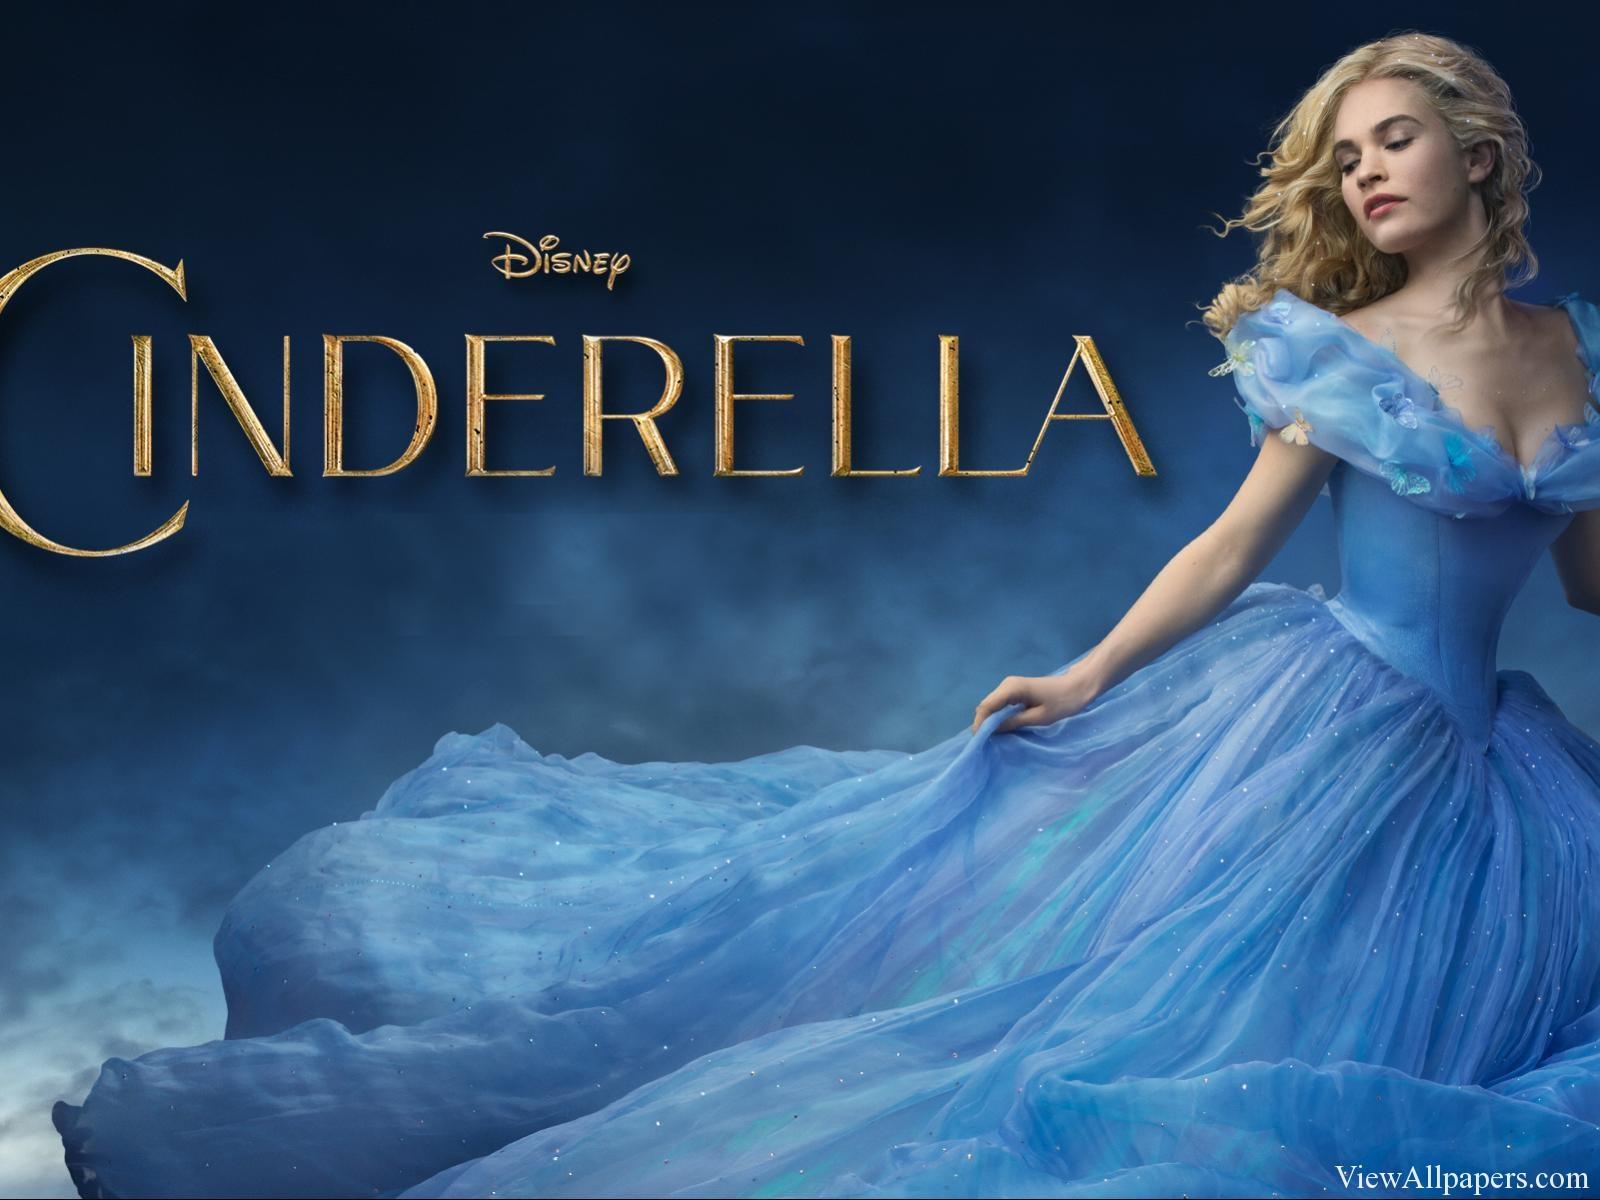 Cinderella 2015 Lily James High Resolution Wallpaper download 1600x1200